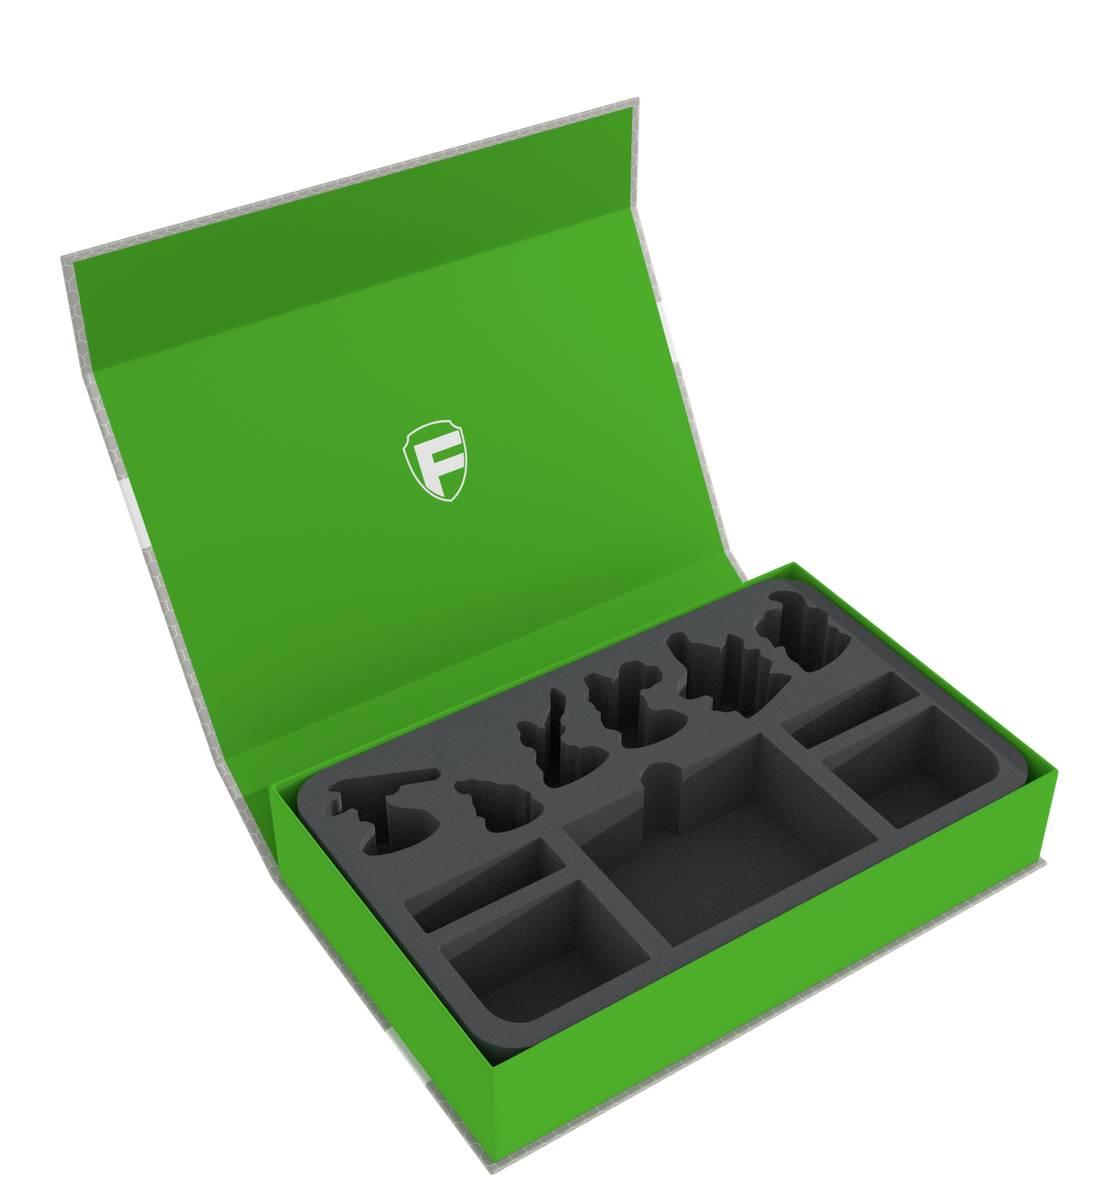 Feldherr Magnetic Box green for Warhammer Underworlds: Nightvault - Godsworn Hunt